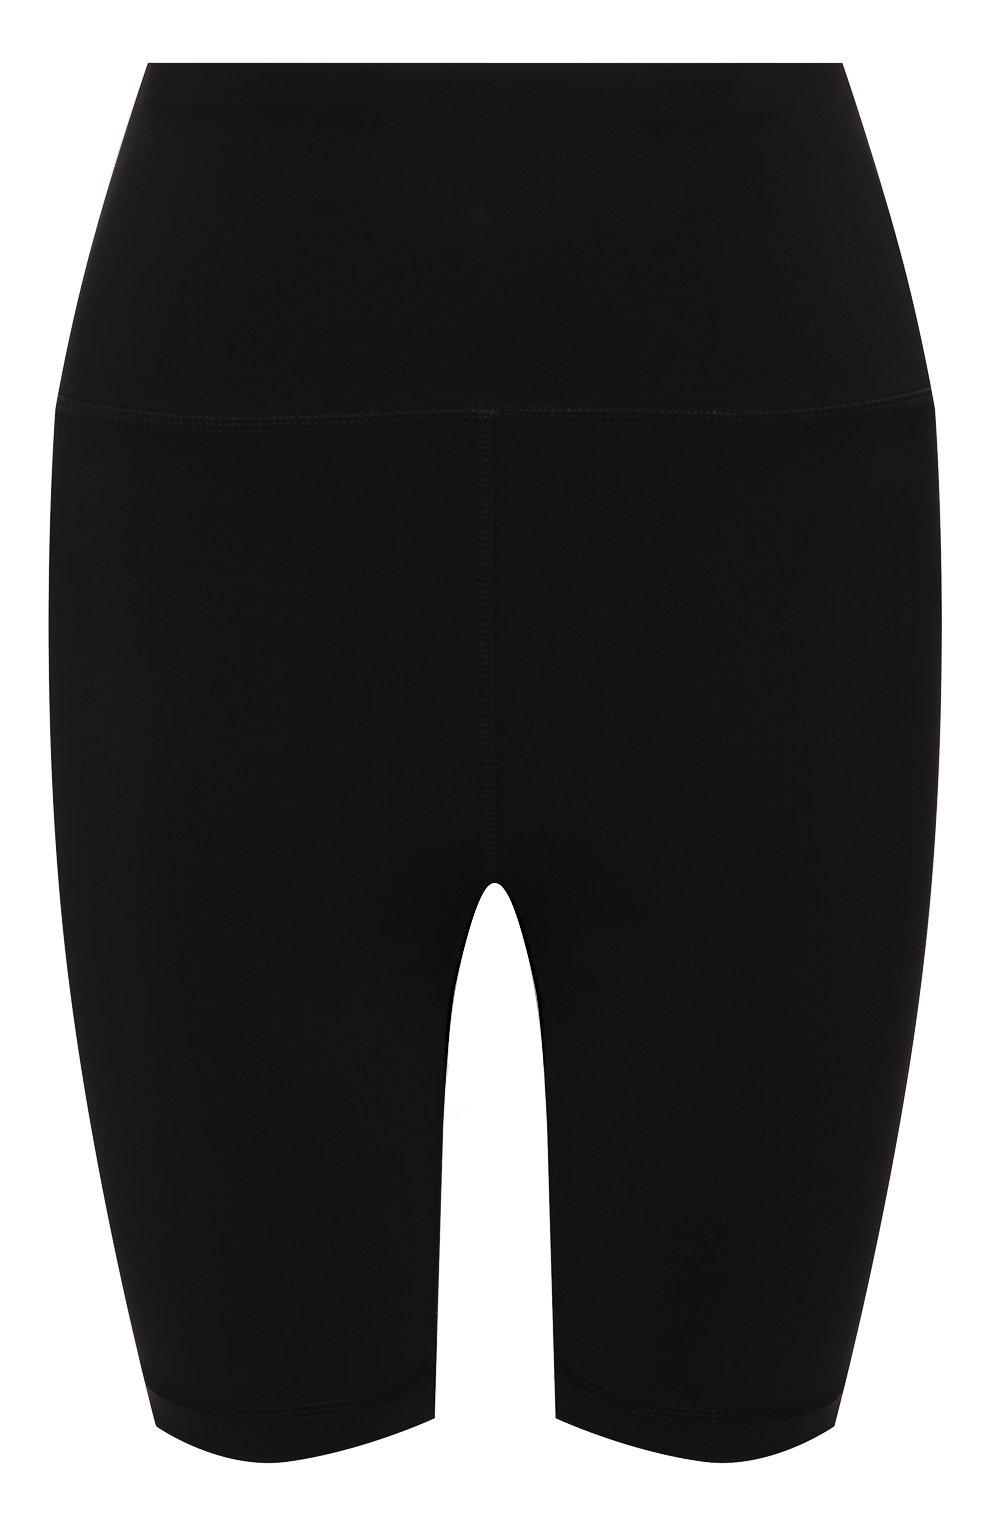 Женские шорты WARDROBE.NYC черного цвета, арт. W2003R02 | Фото 1